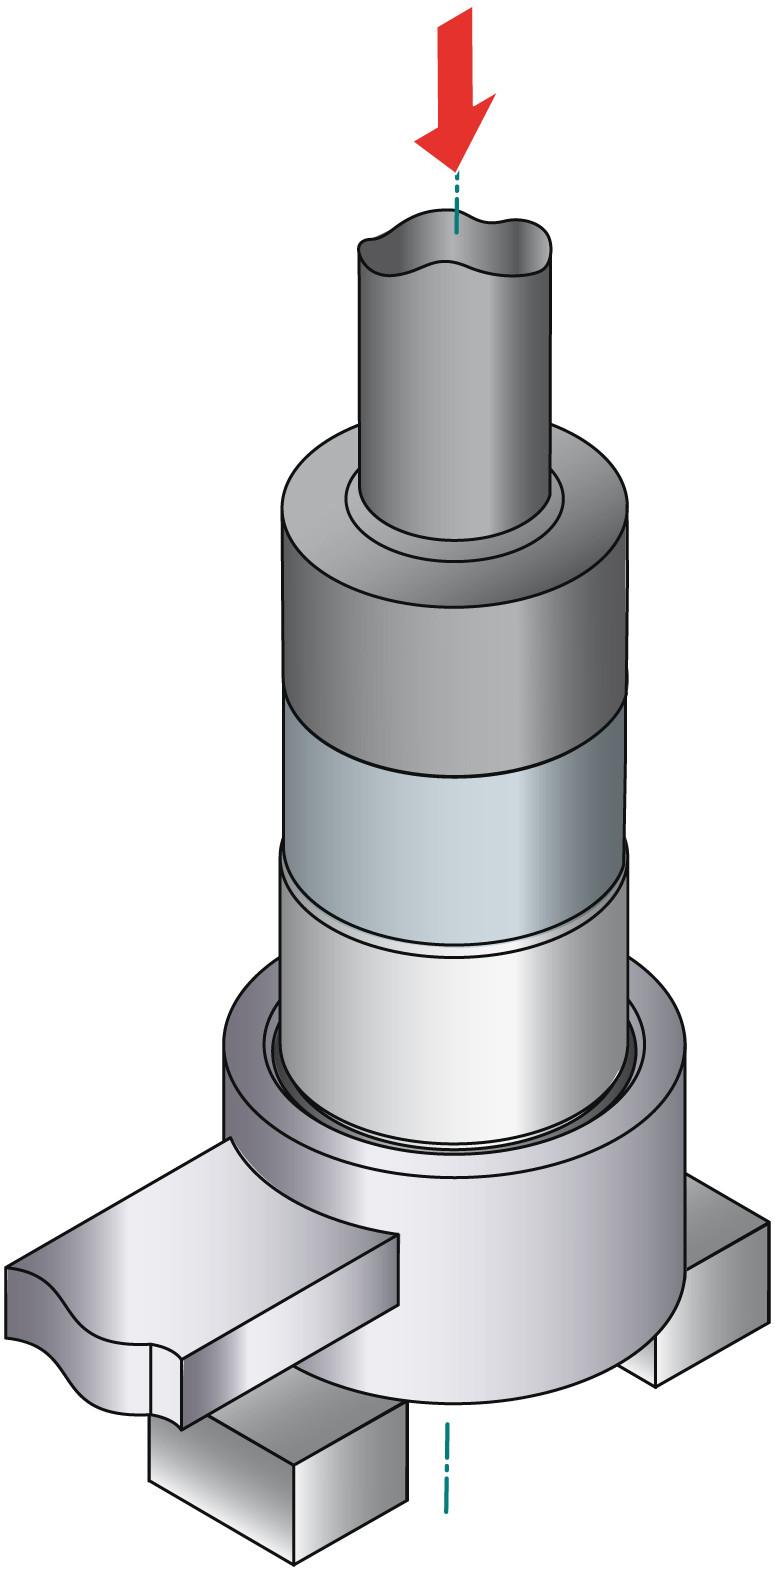 obraz montaż tulei metal-guma-metal 3